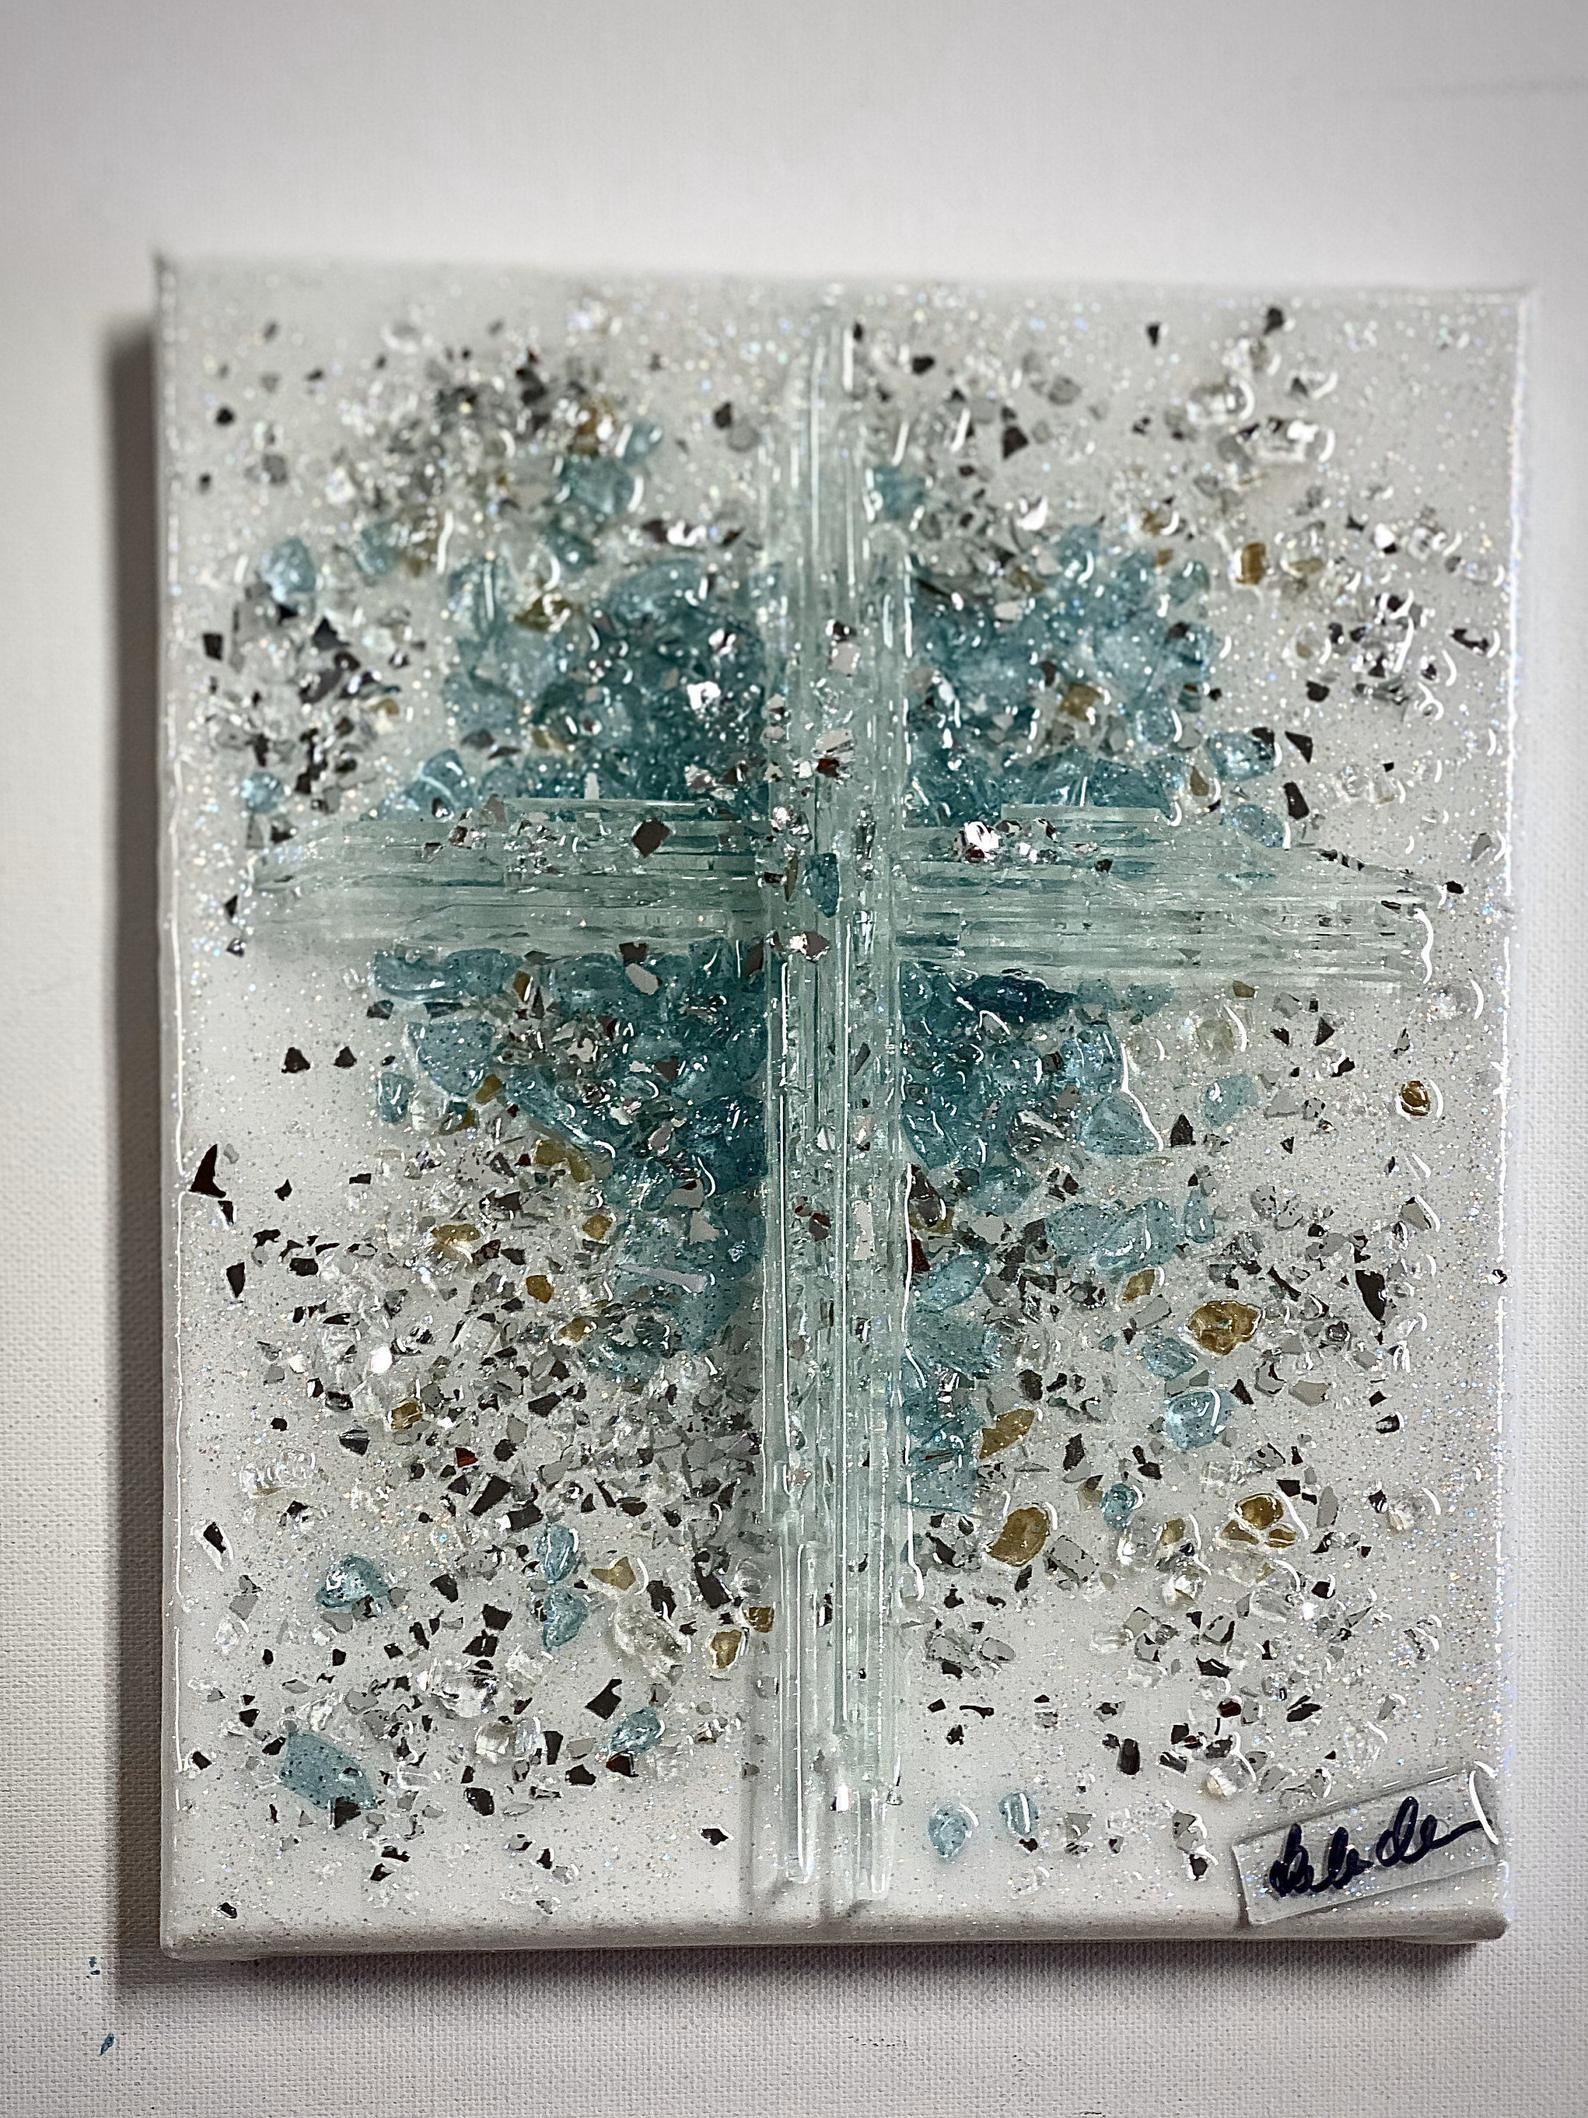 Broken glass art etsy in 2020 broken glass art art